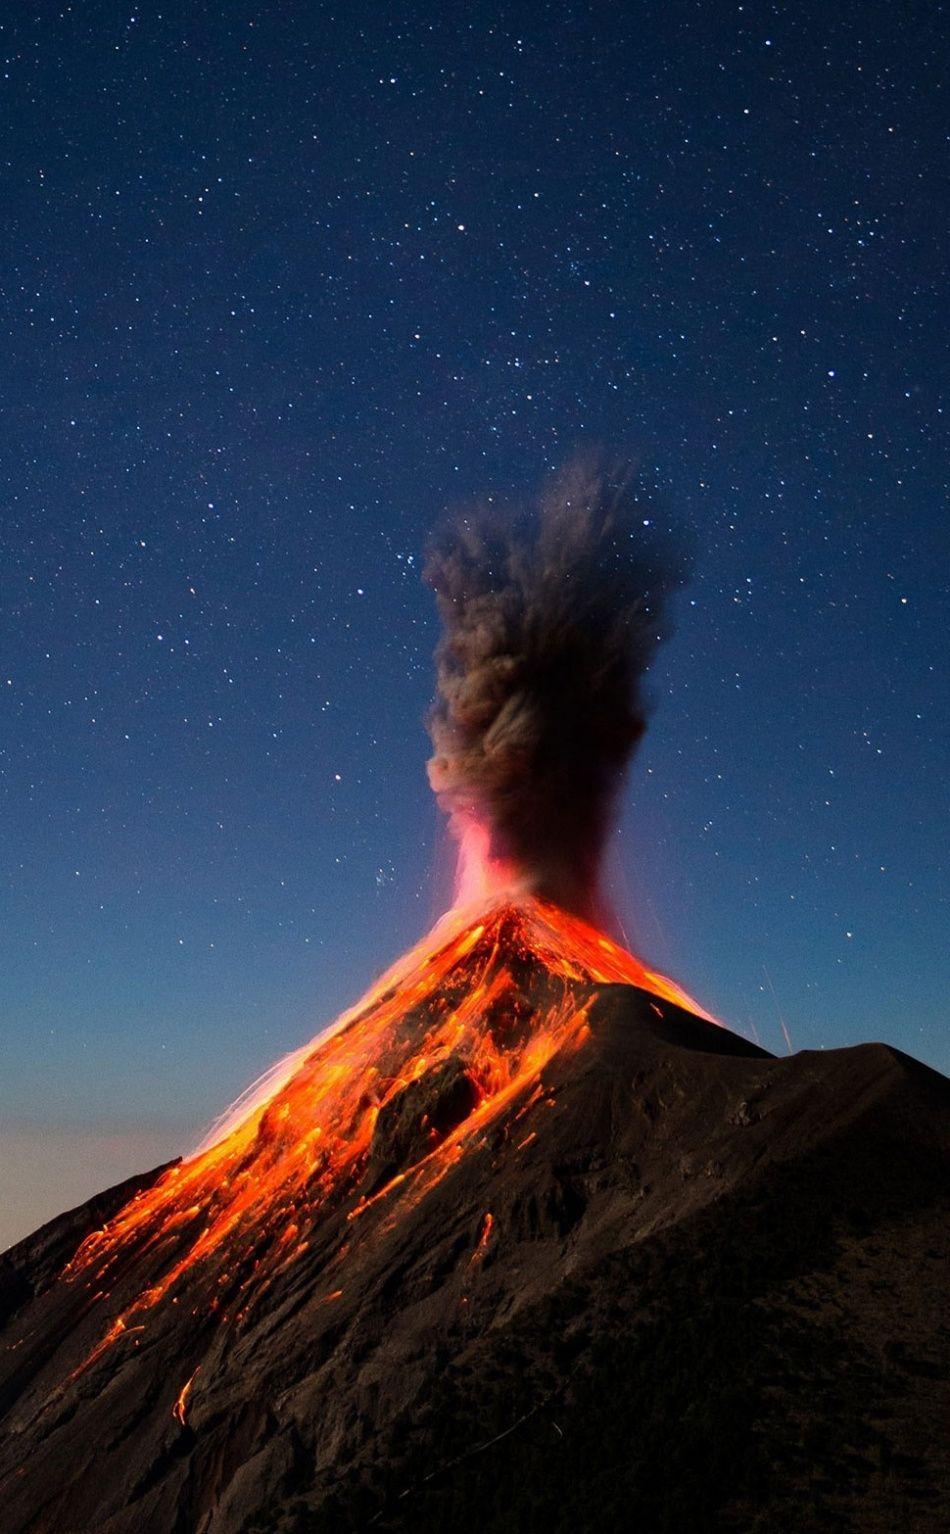 Volcano eruption lava mountain 950x1534 wallpaper Volcano 950x1534